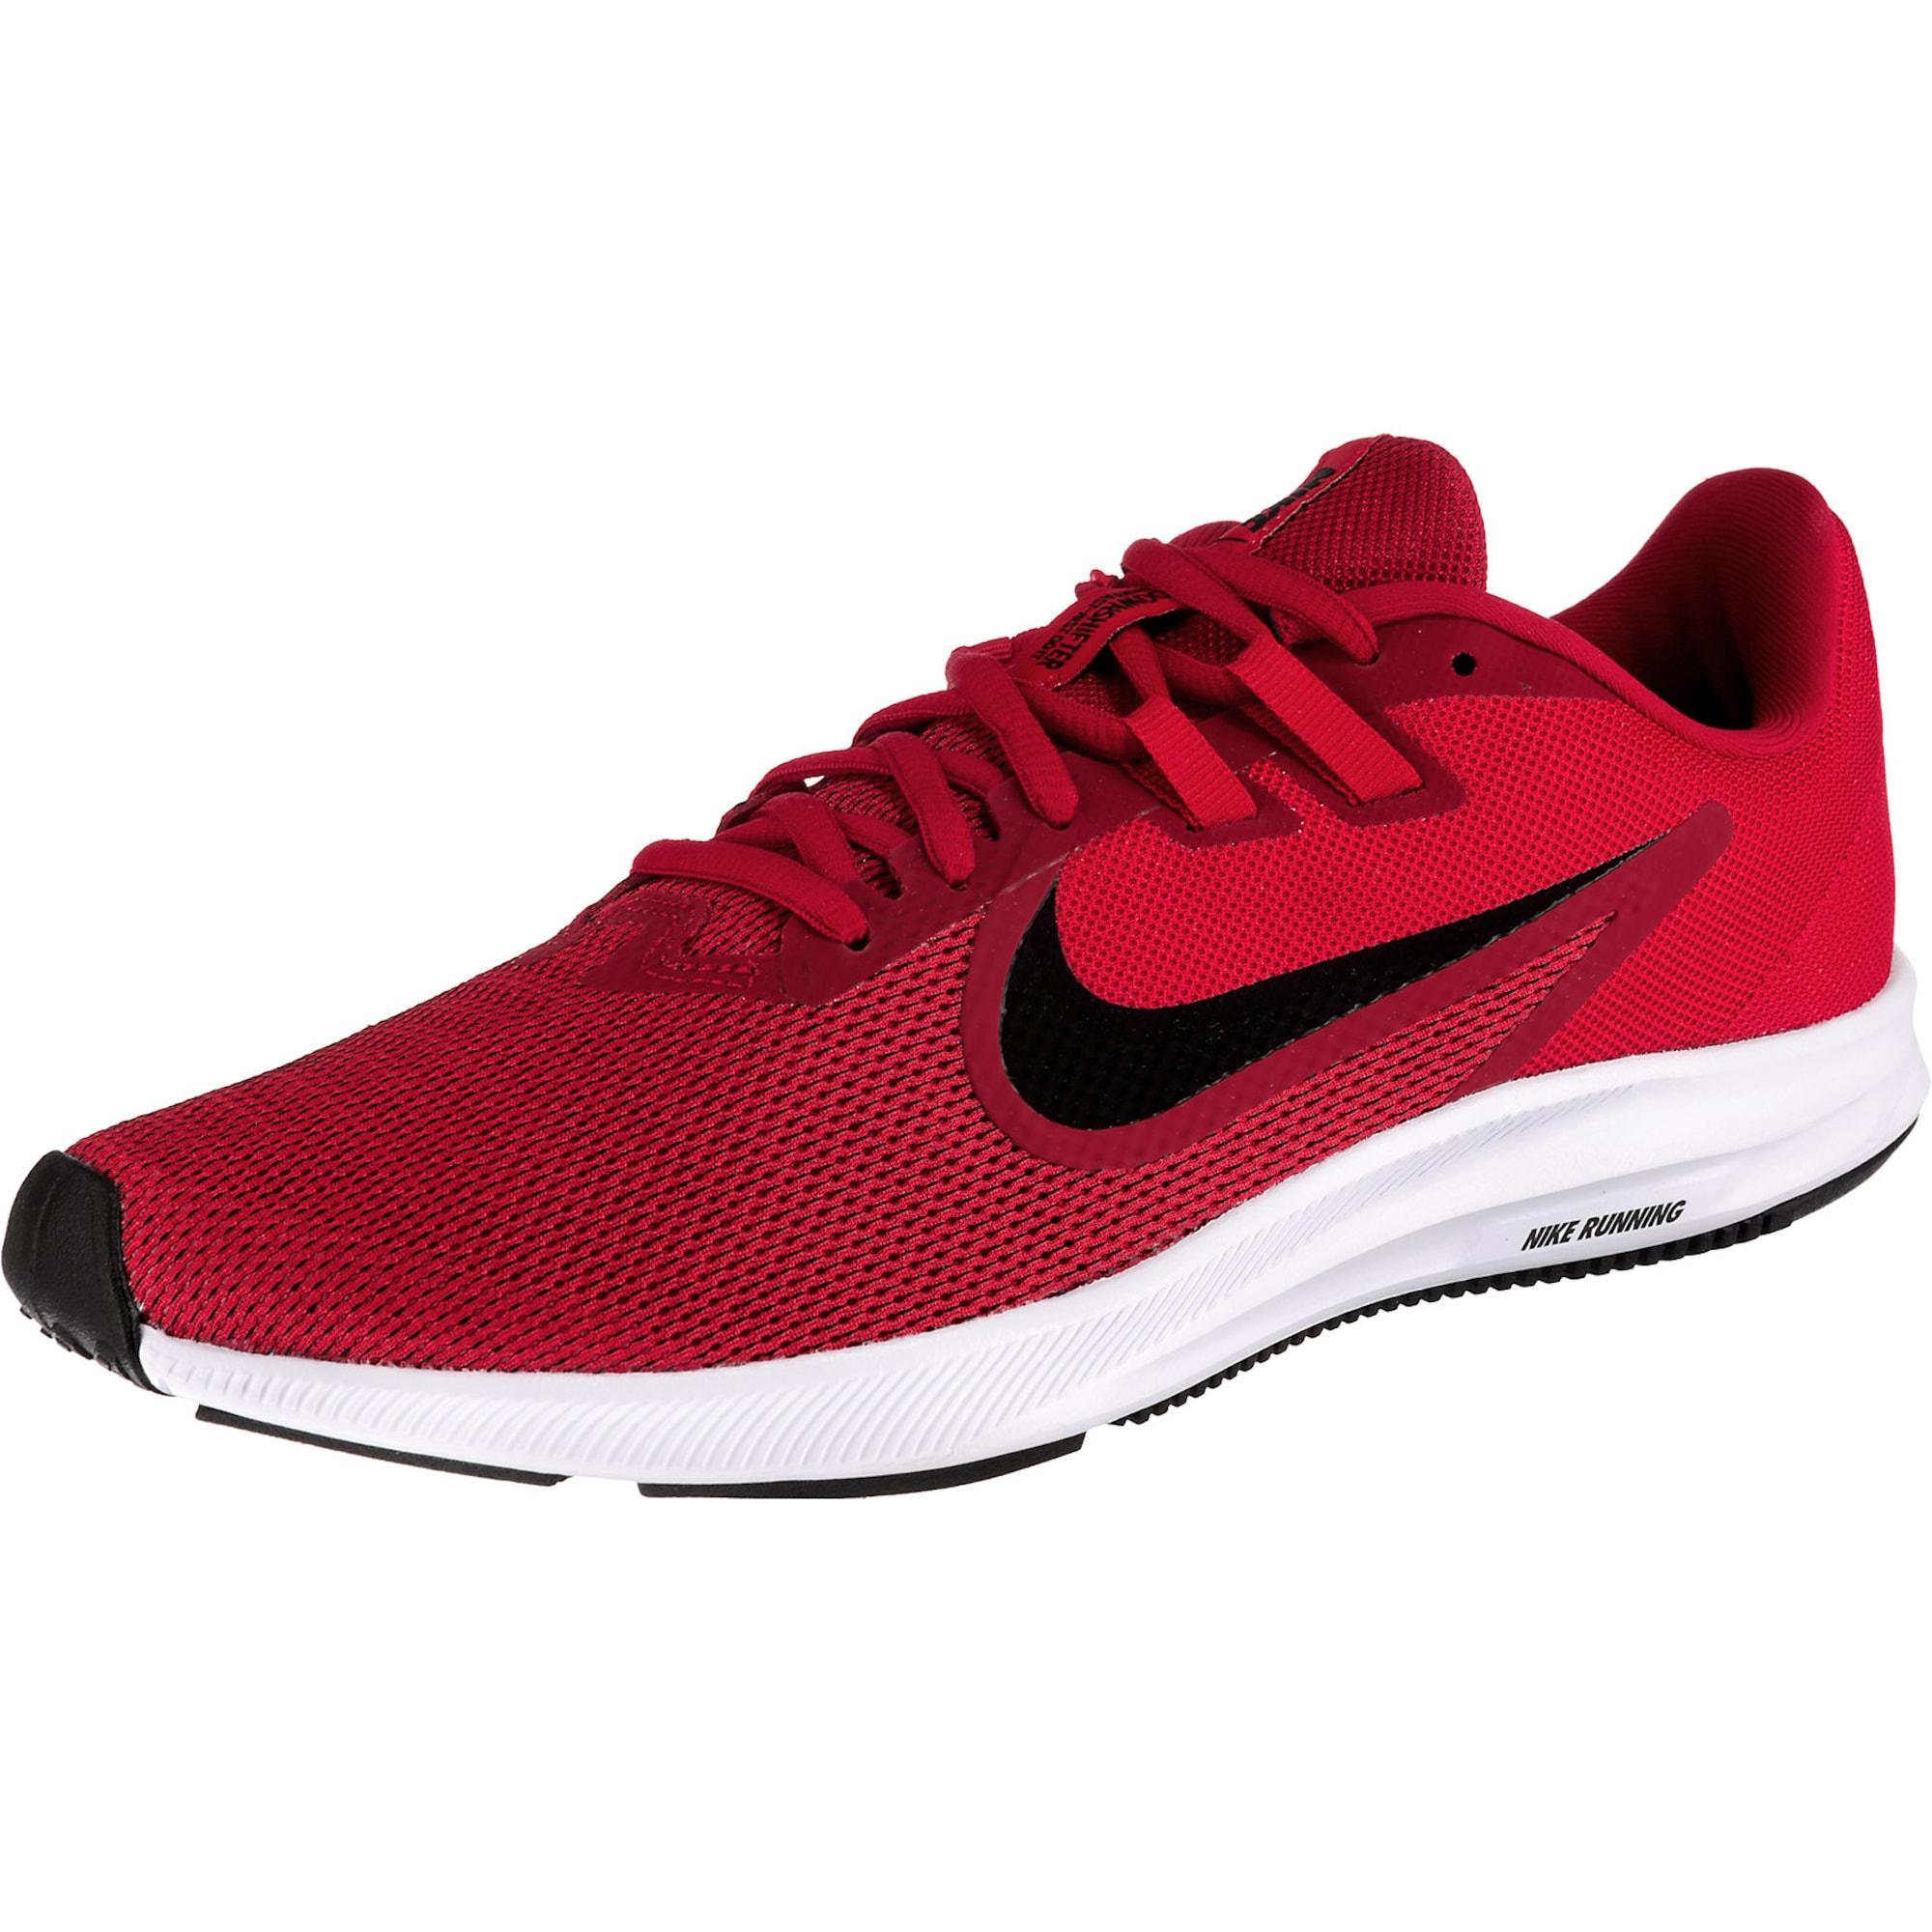 NIKE Bėgimo batai 'Downshifter 9' raudona / juoda